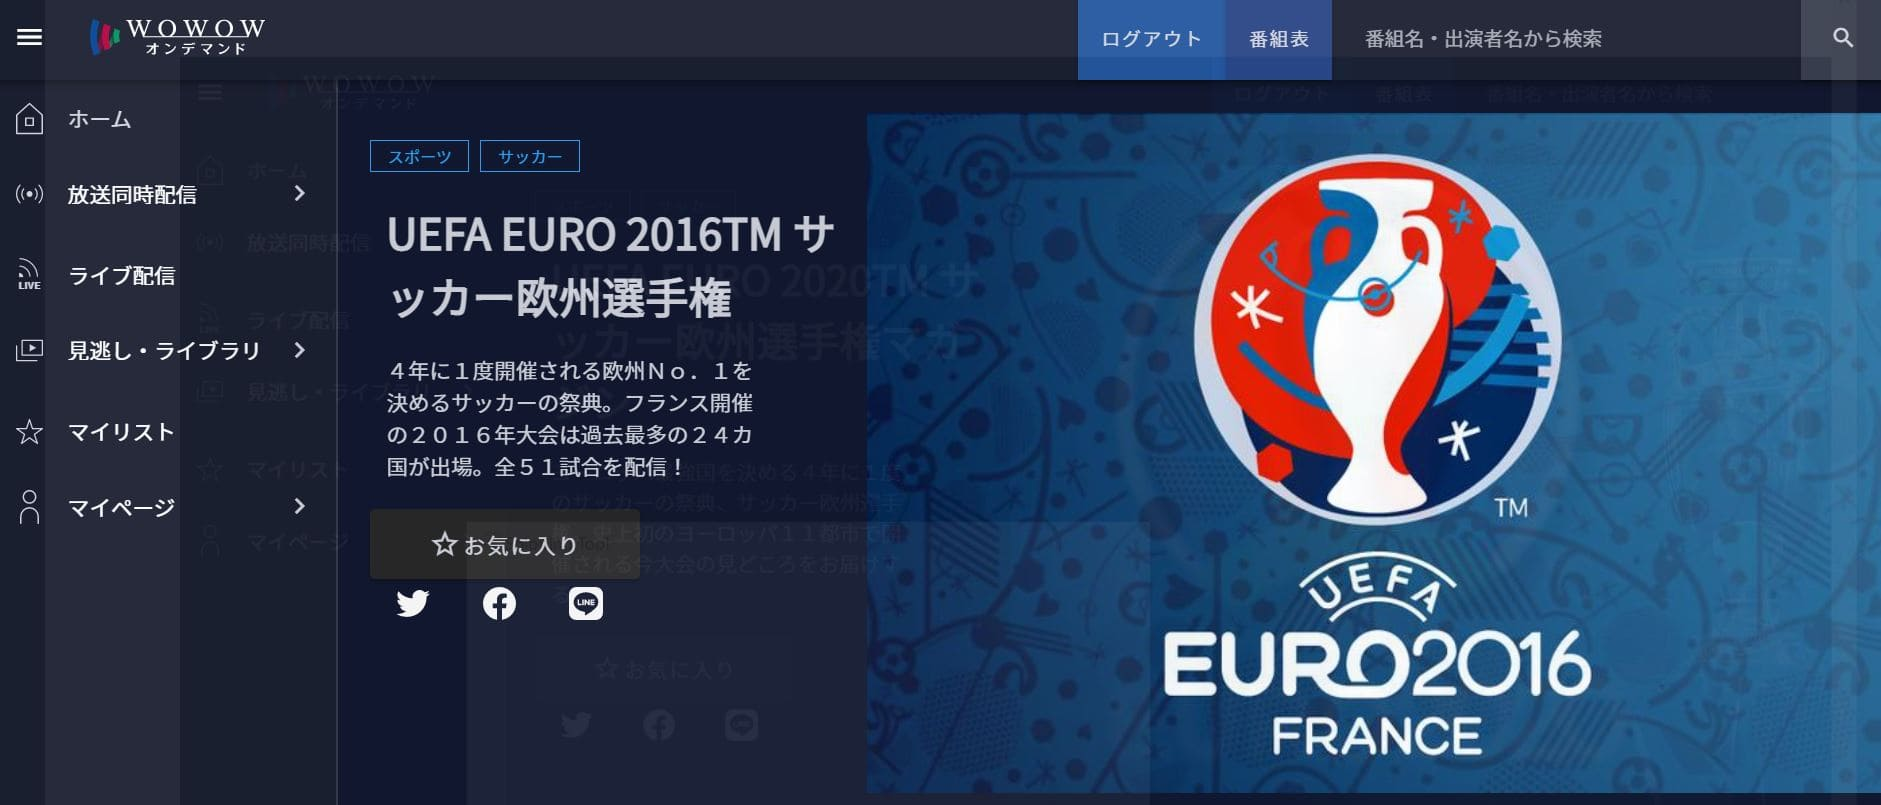 UEFAユーロ2016サッカー欧州選手権見逃し配信